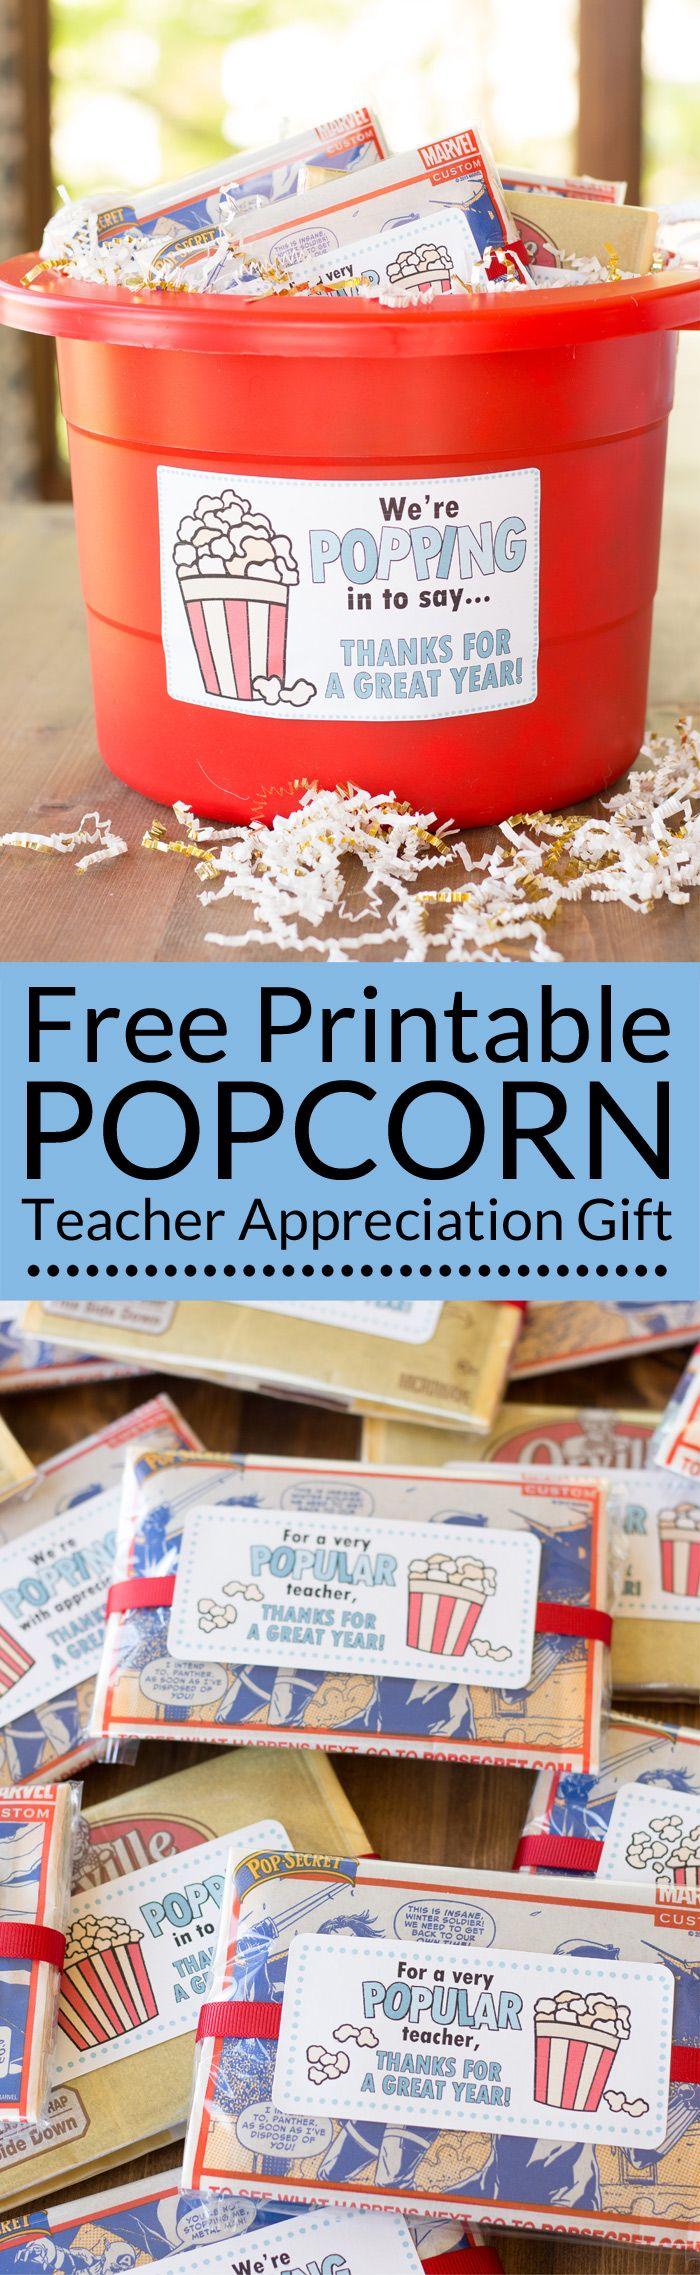 Popcorn Teacher Appreciation Gifts | Free printable gift ...